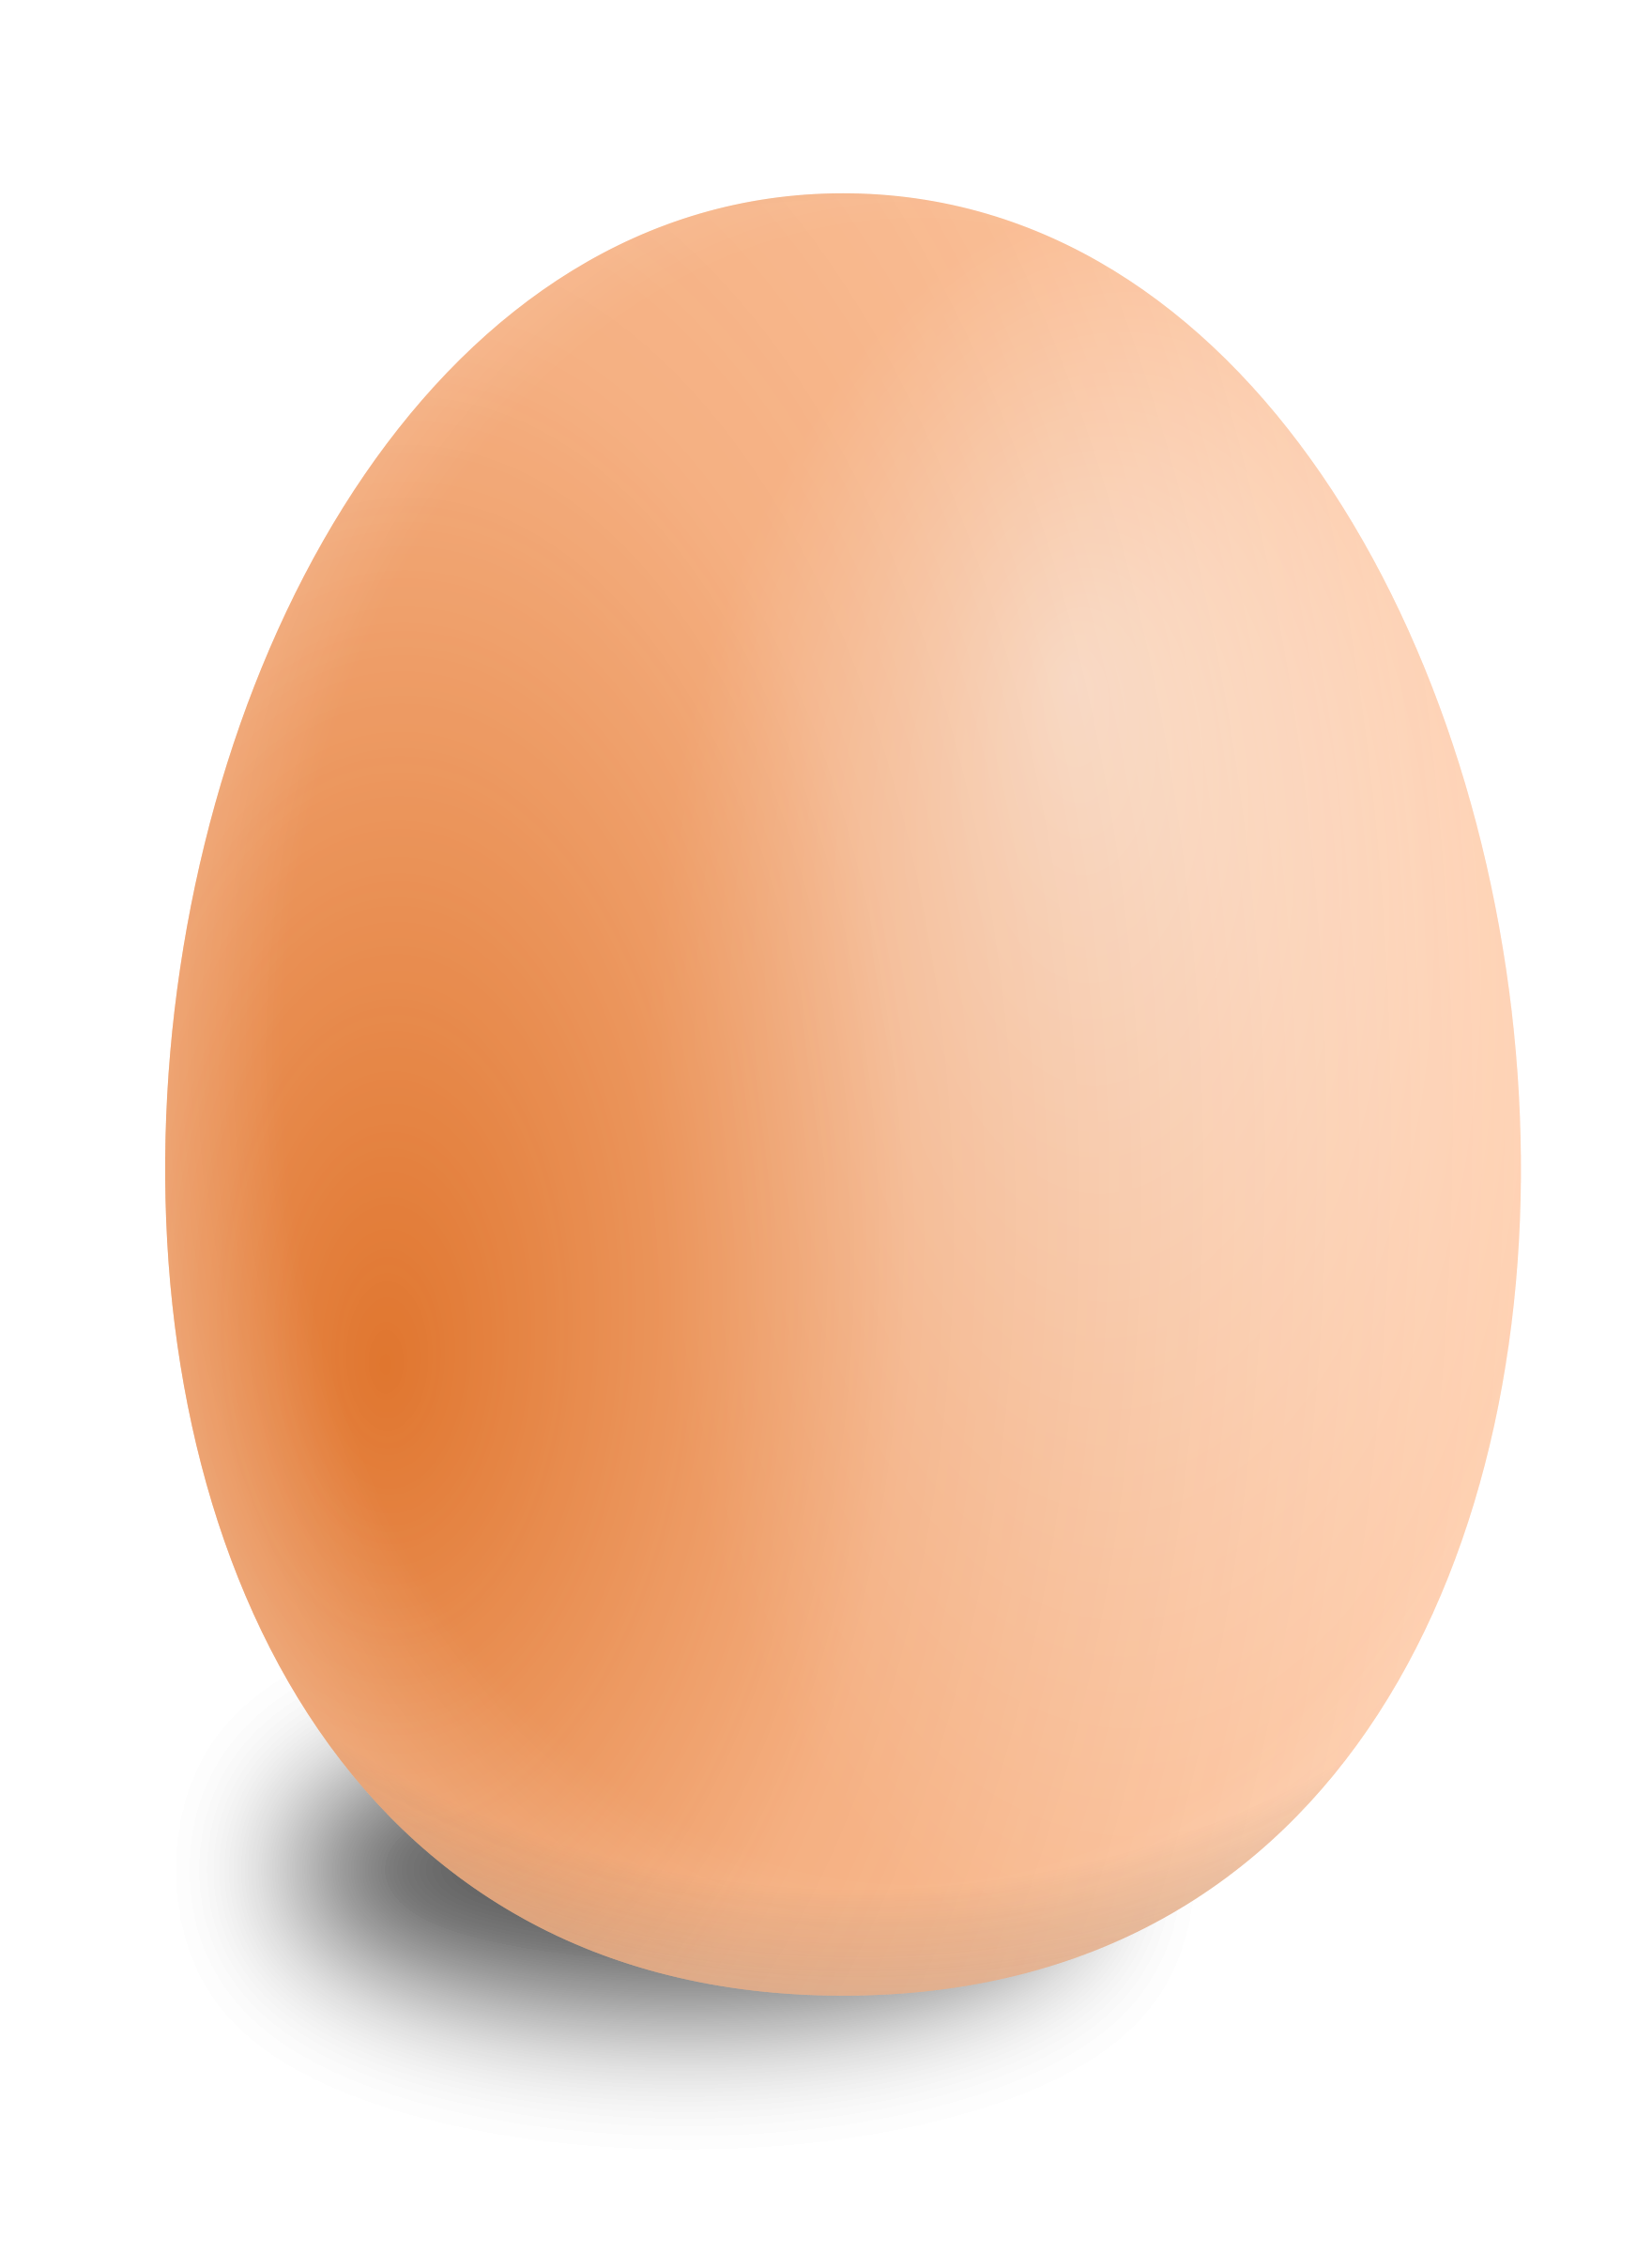 Egg Clipart & Egg Clip Art Images.